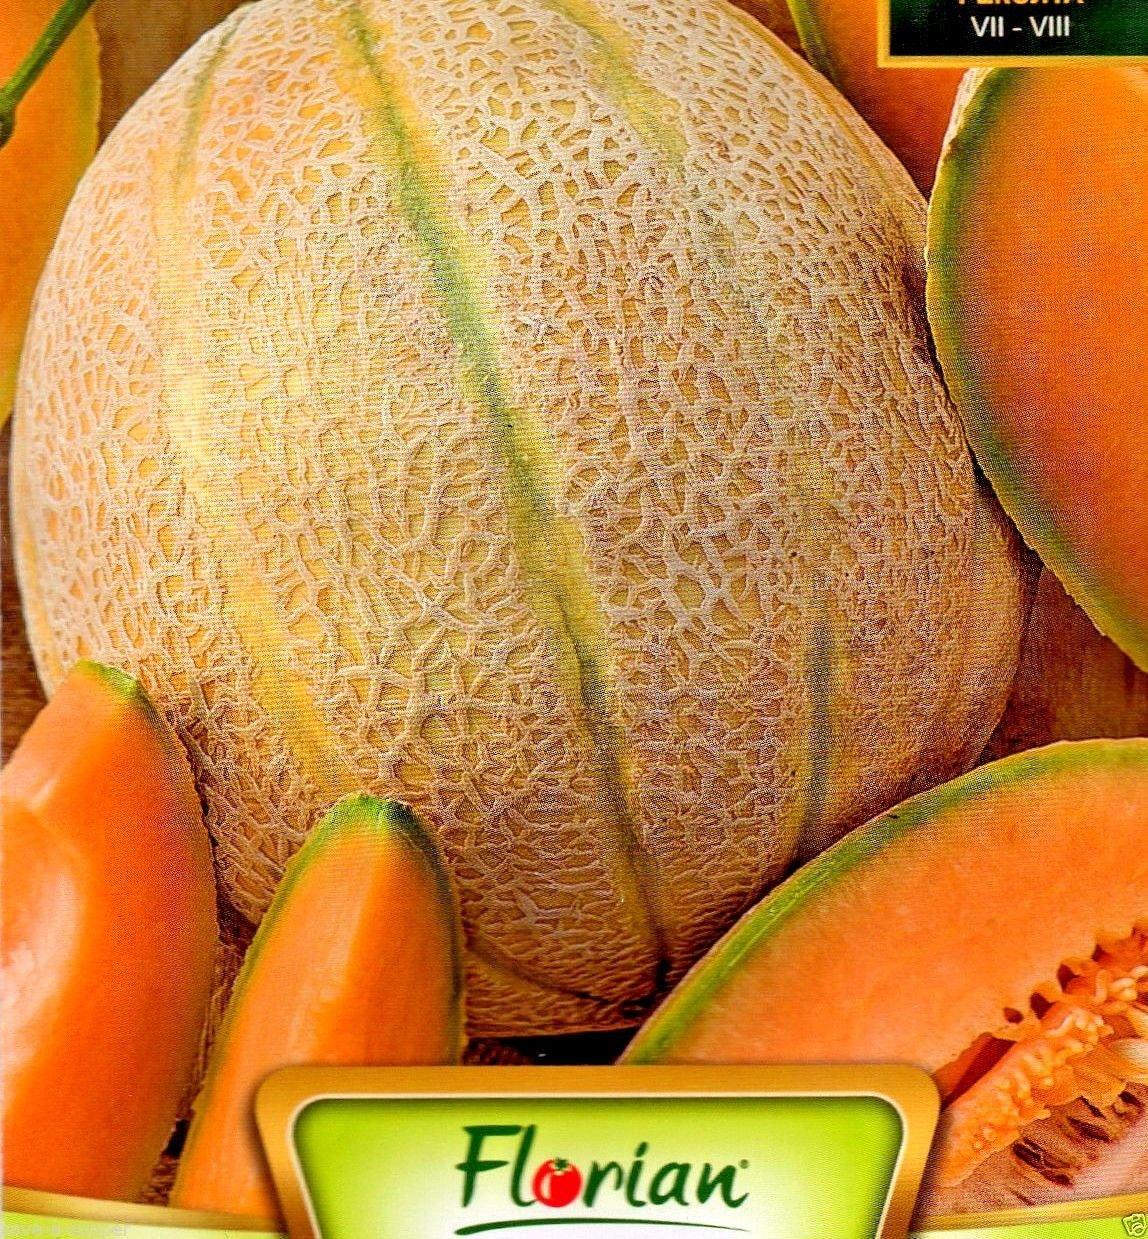 ITALIAN VARIETY MELON RETATO DEGLI ORTOLANI 60 HIGH QUALITY FRUIT SEEDS //268